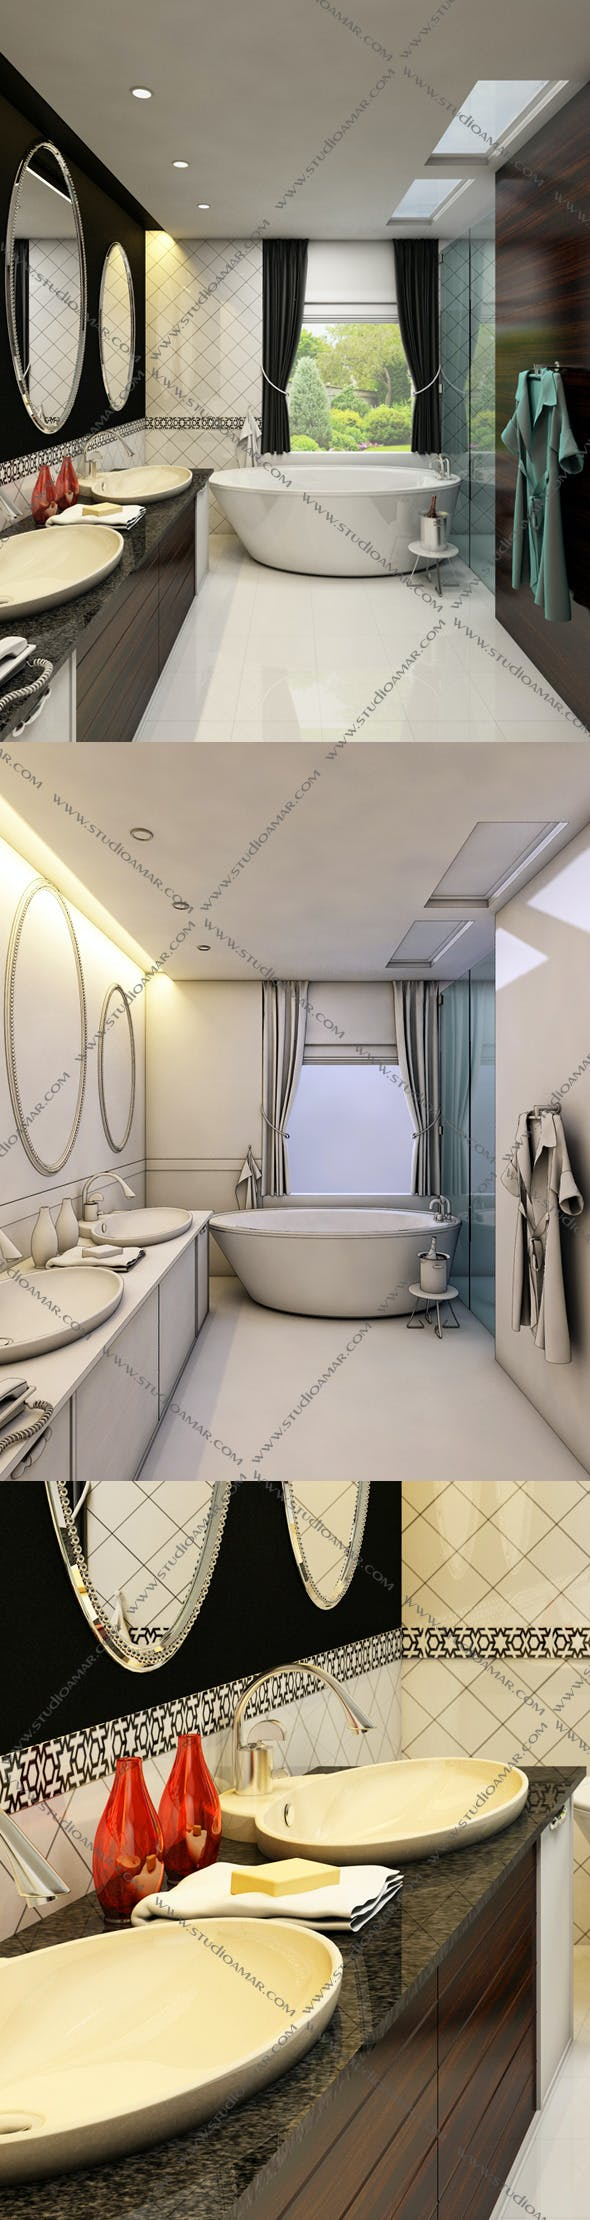 Realistic Bathroom 131 - 3DOcean Item for Sale